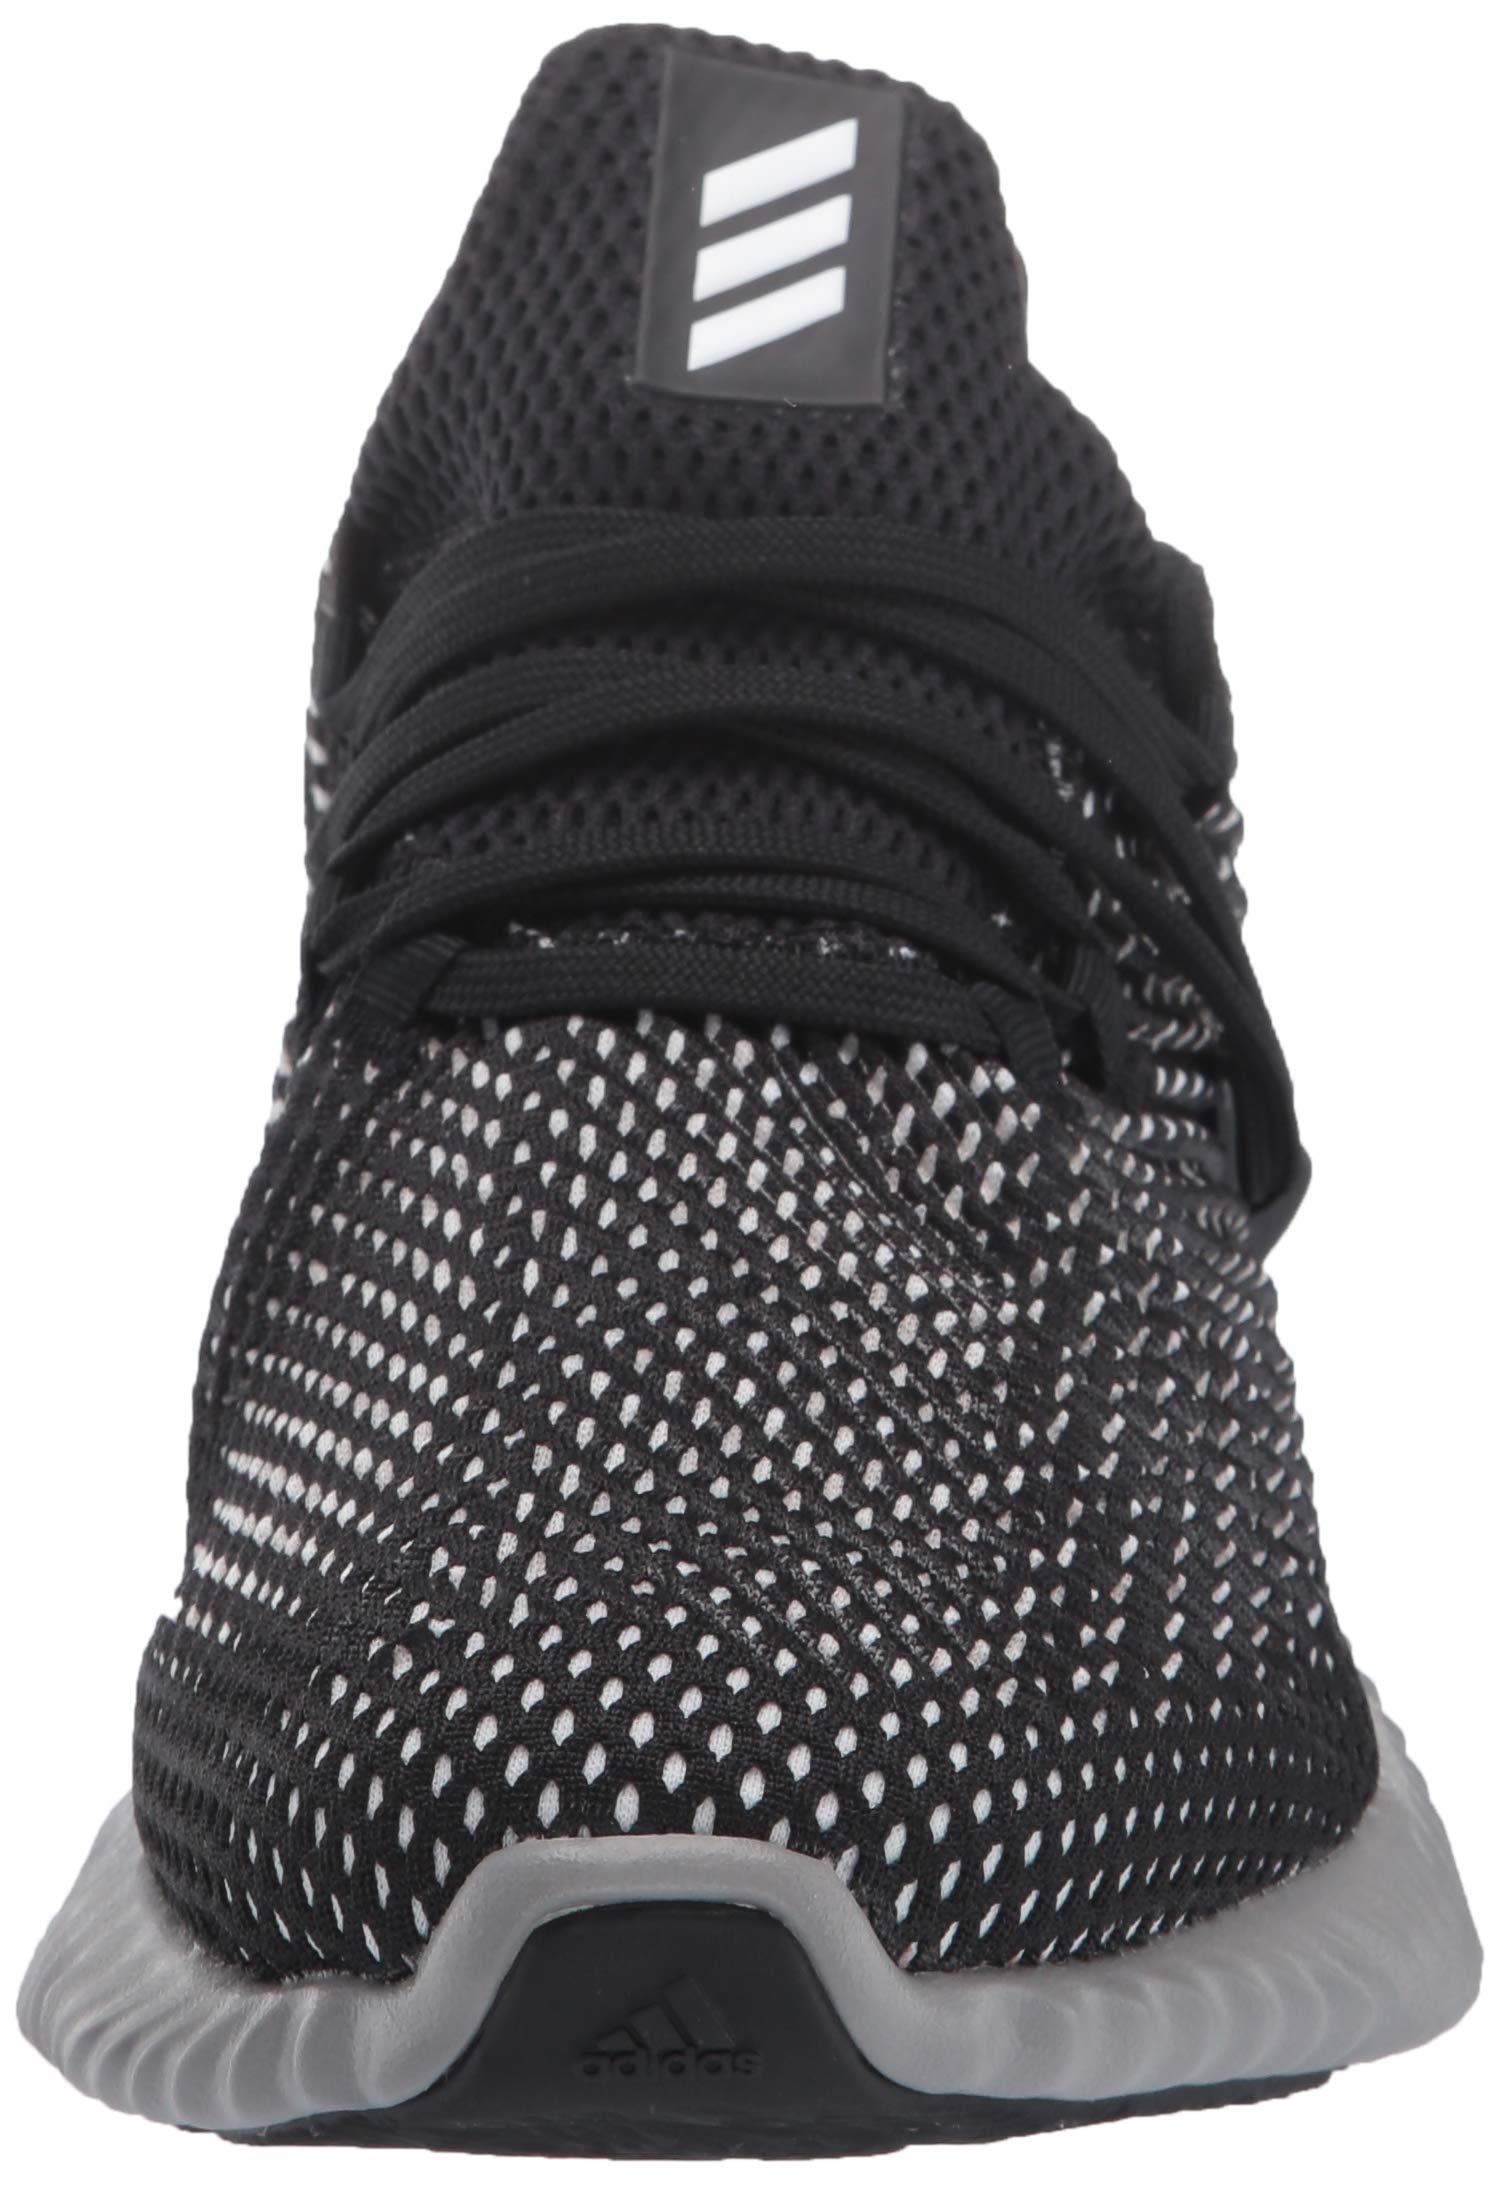 Adidas Kids Alphabounce Instinct, Black/White/Grey, 1 M US Little Kid by adidas (Image #4)